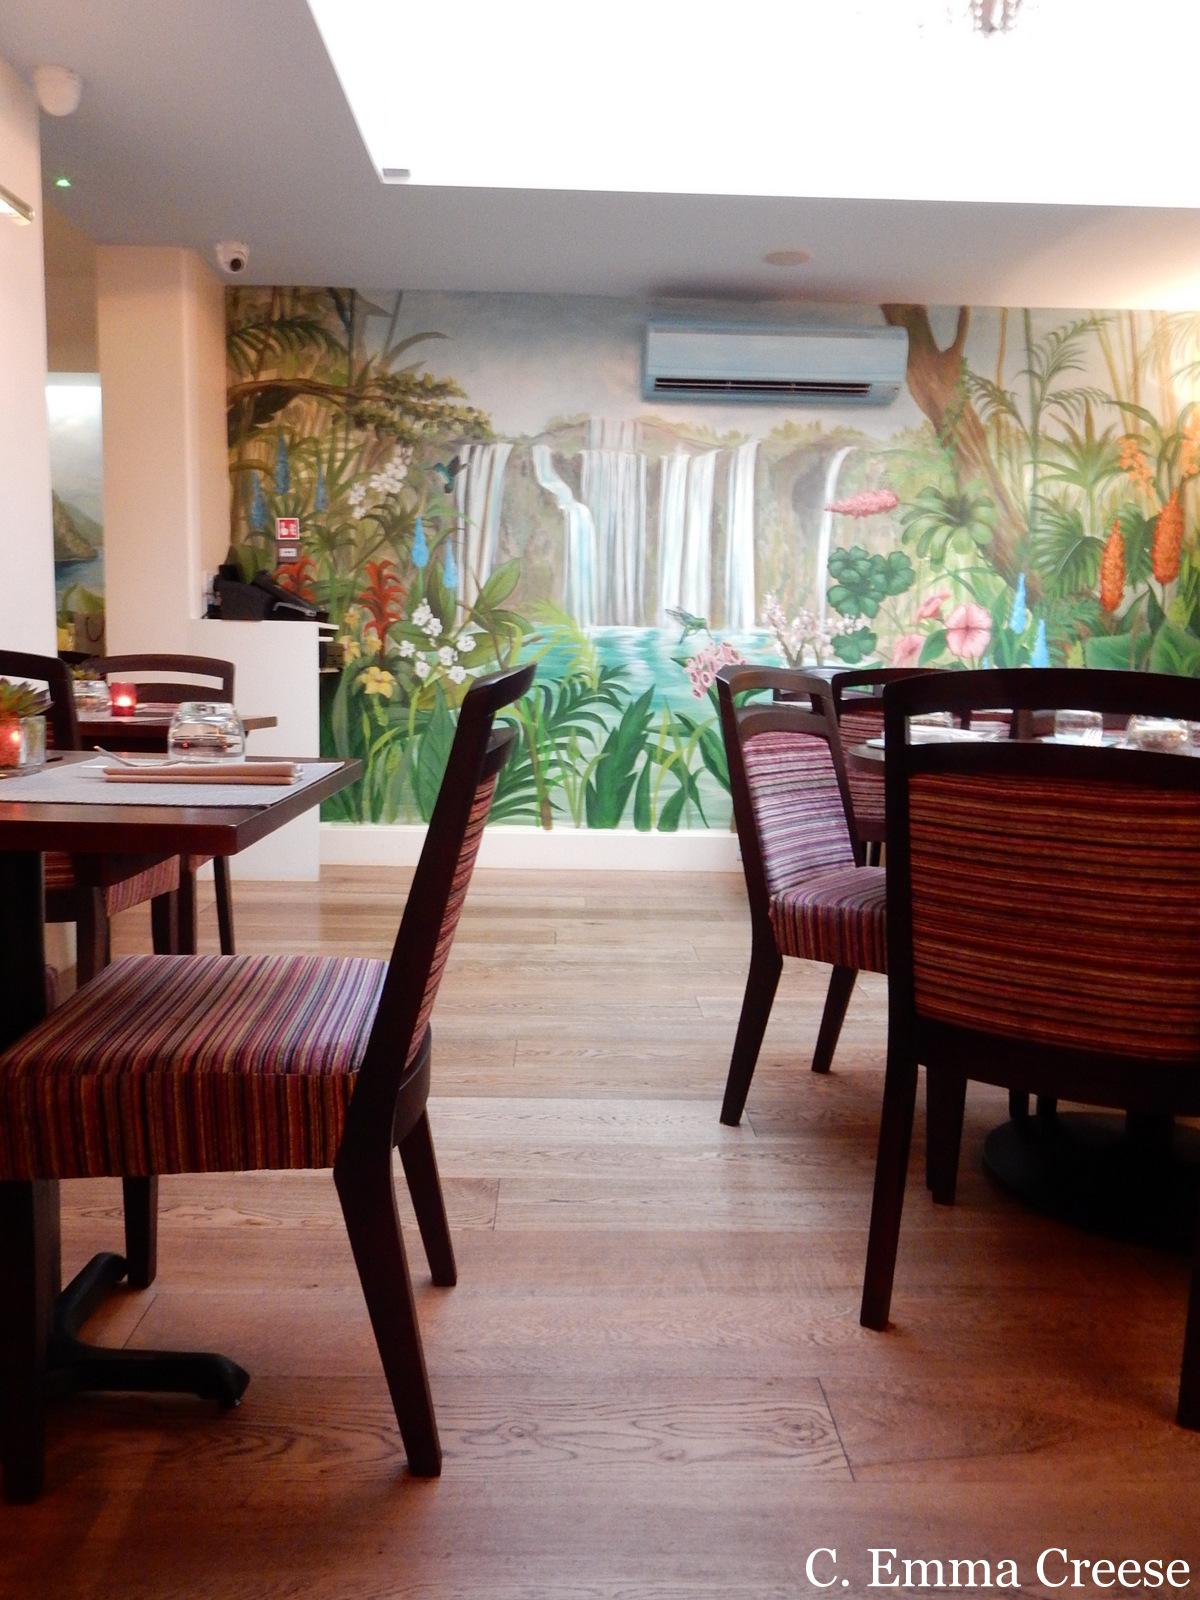 Cottons Caribbean Restaurant Review Nottinghill Adventures of a London Kiwi